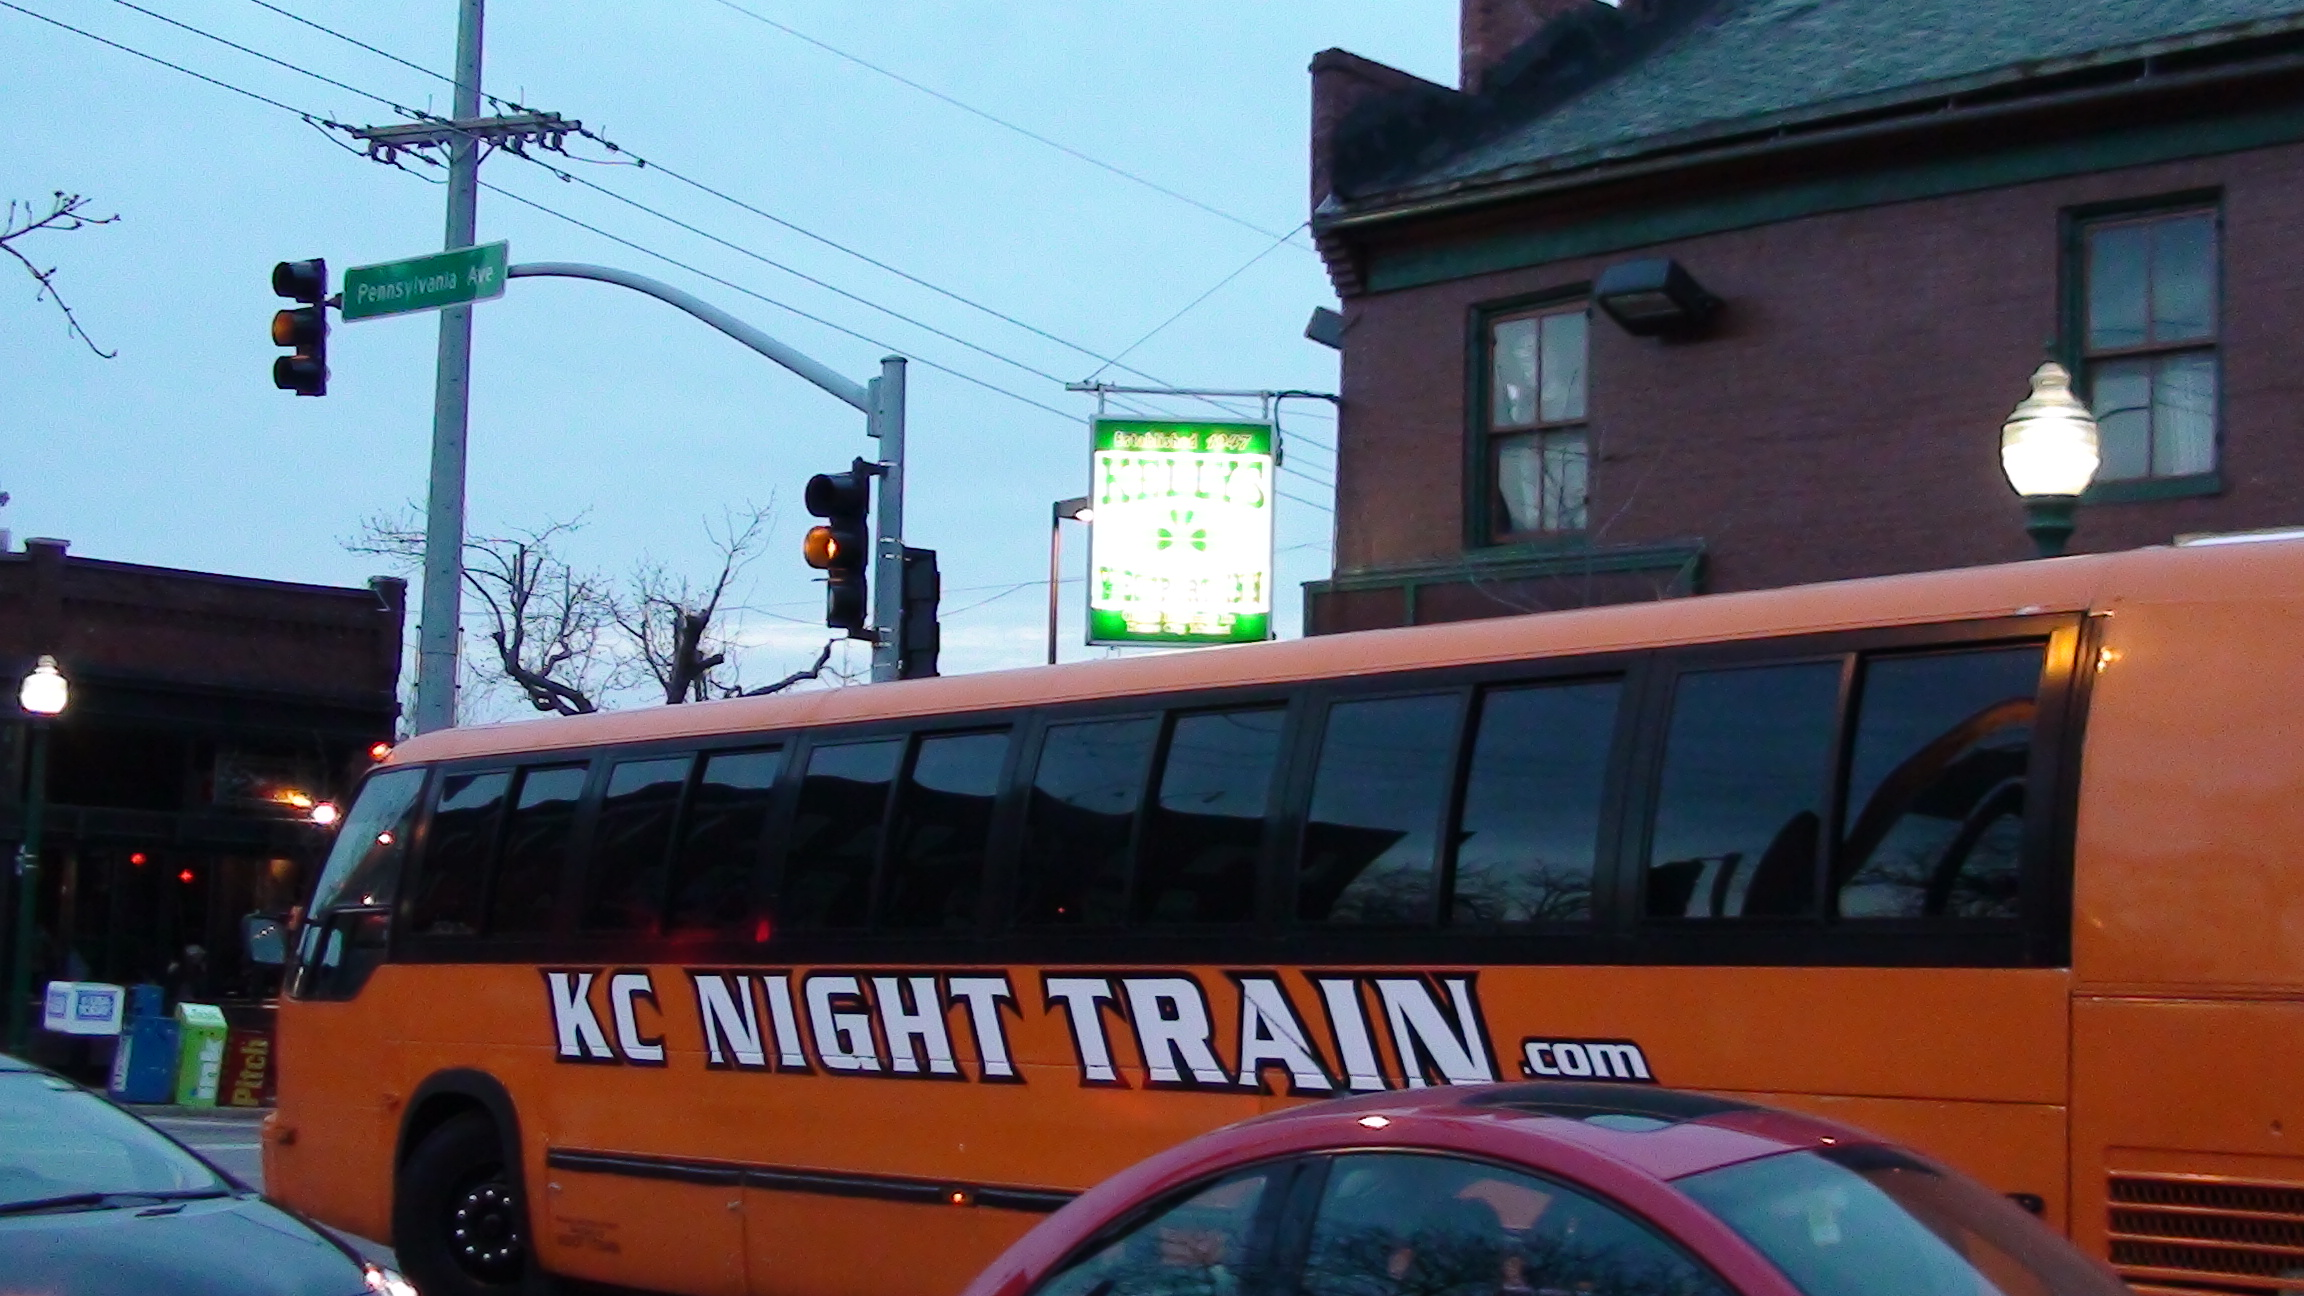 kansas-city-night-train-orange-party-bus-kelly